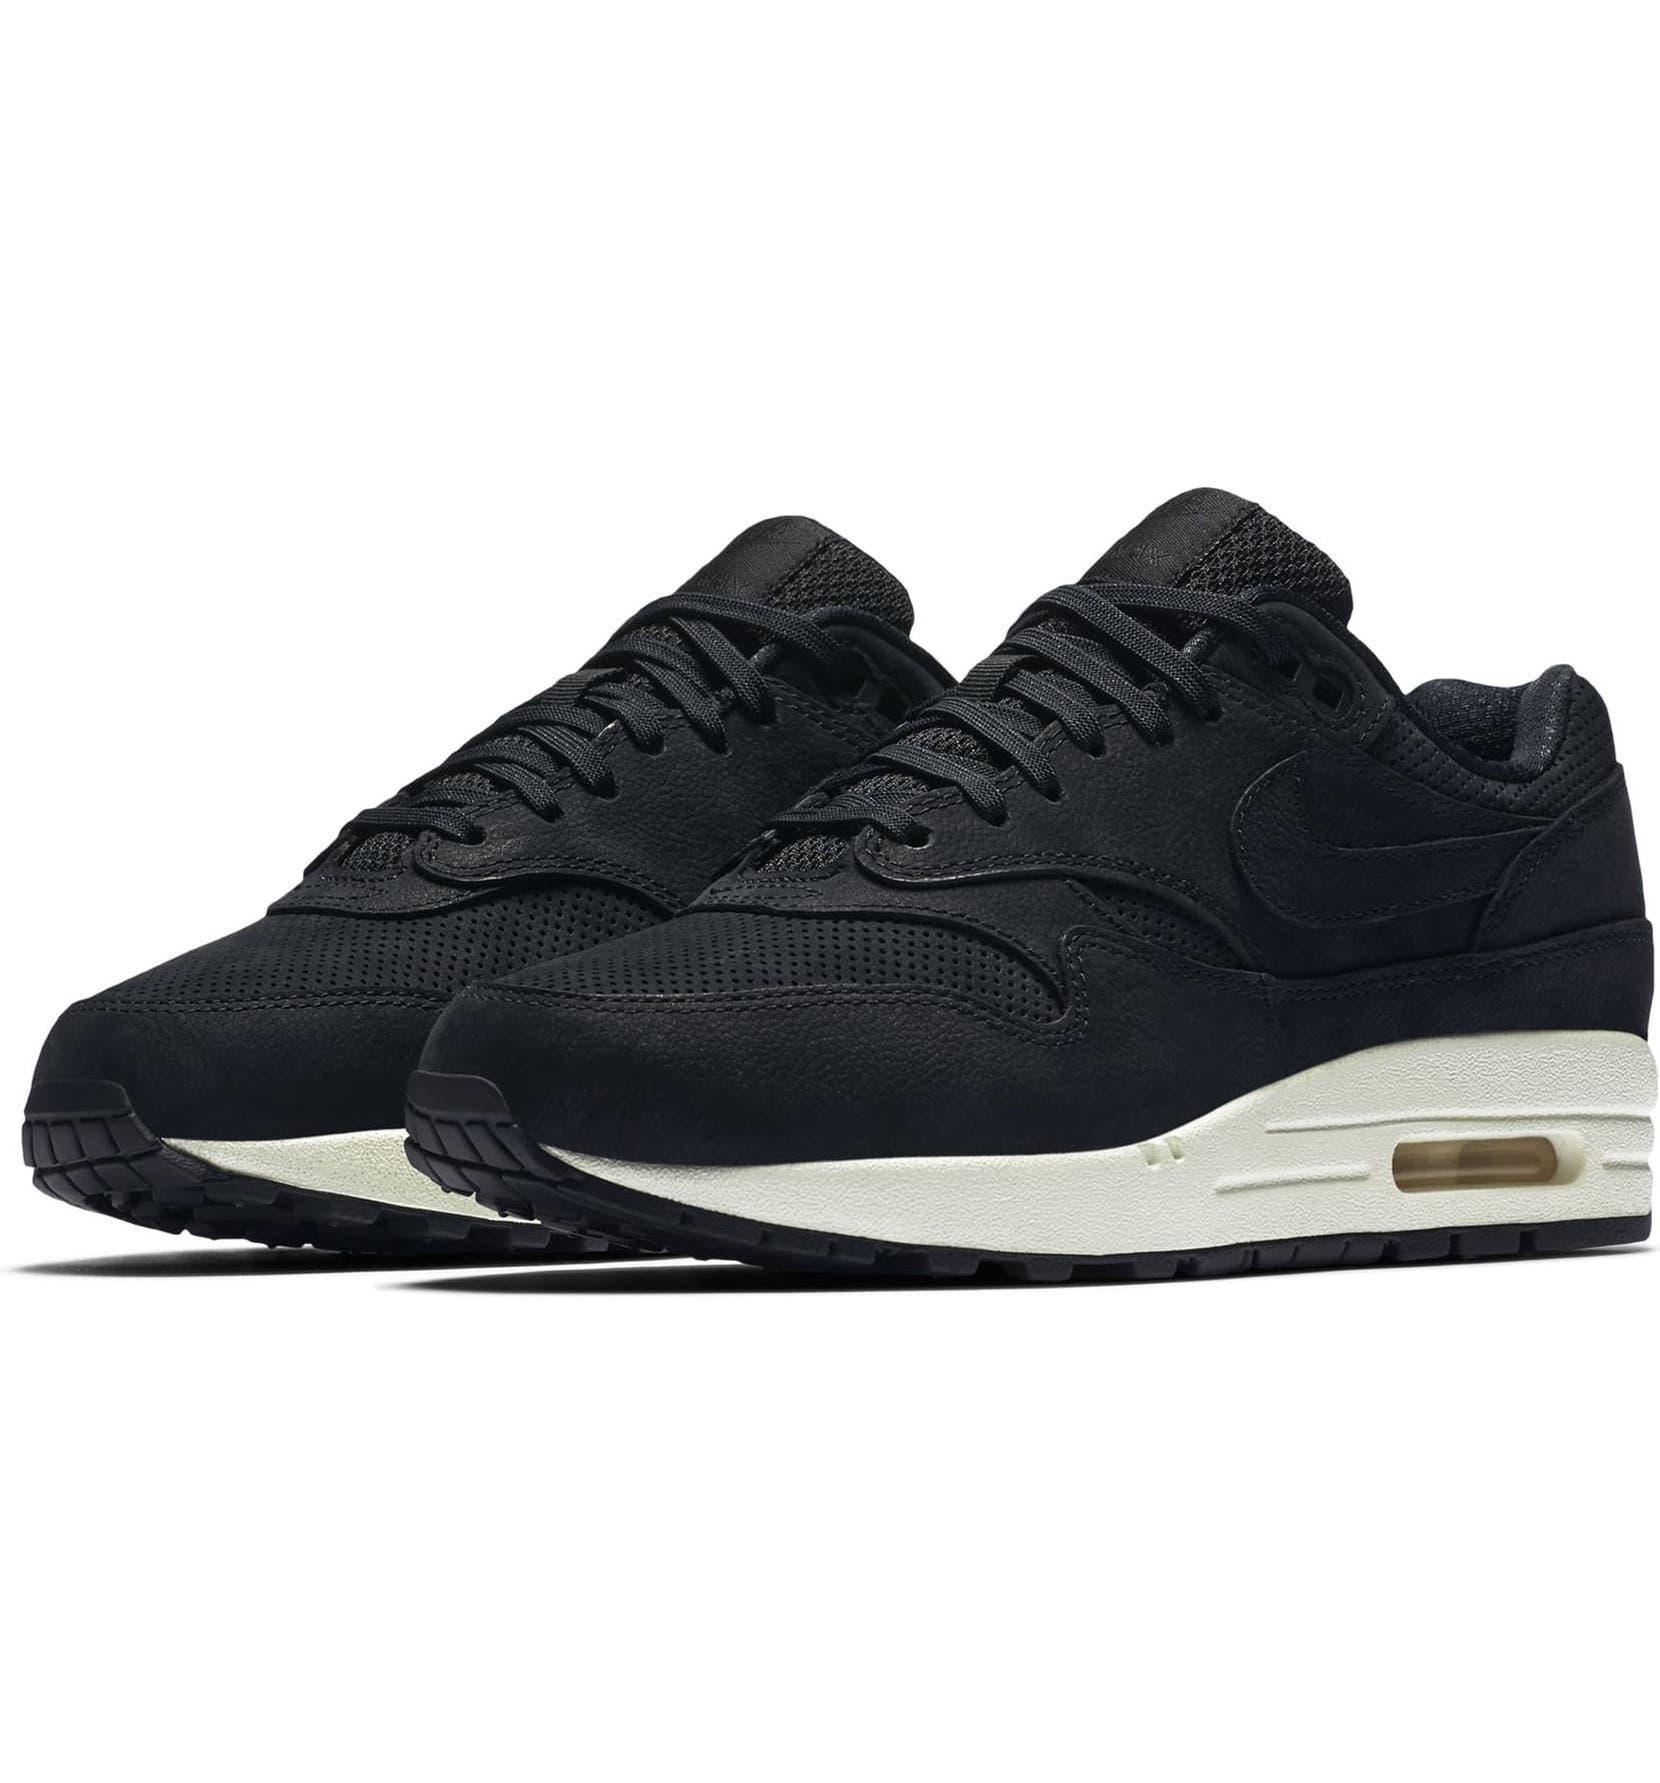 Air Max 1 Pinnacle Sneaker